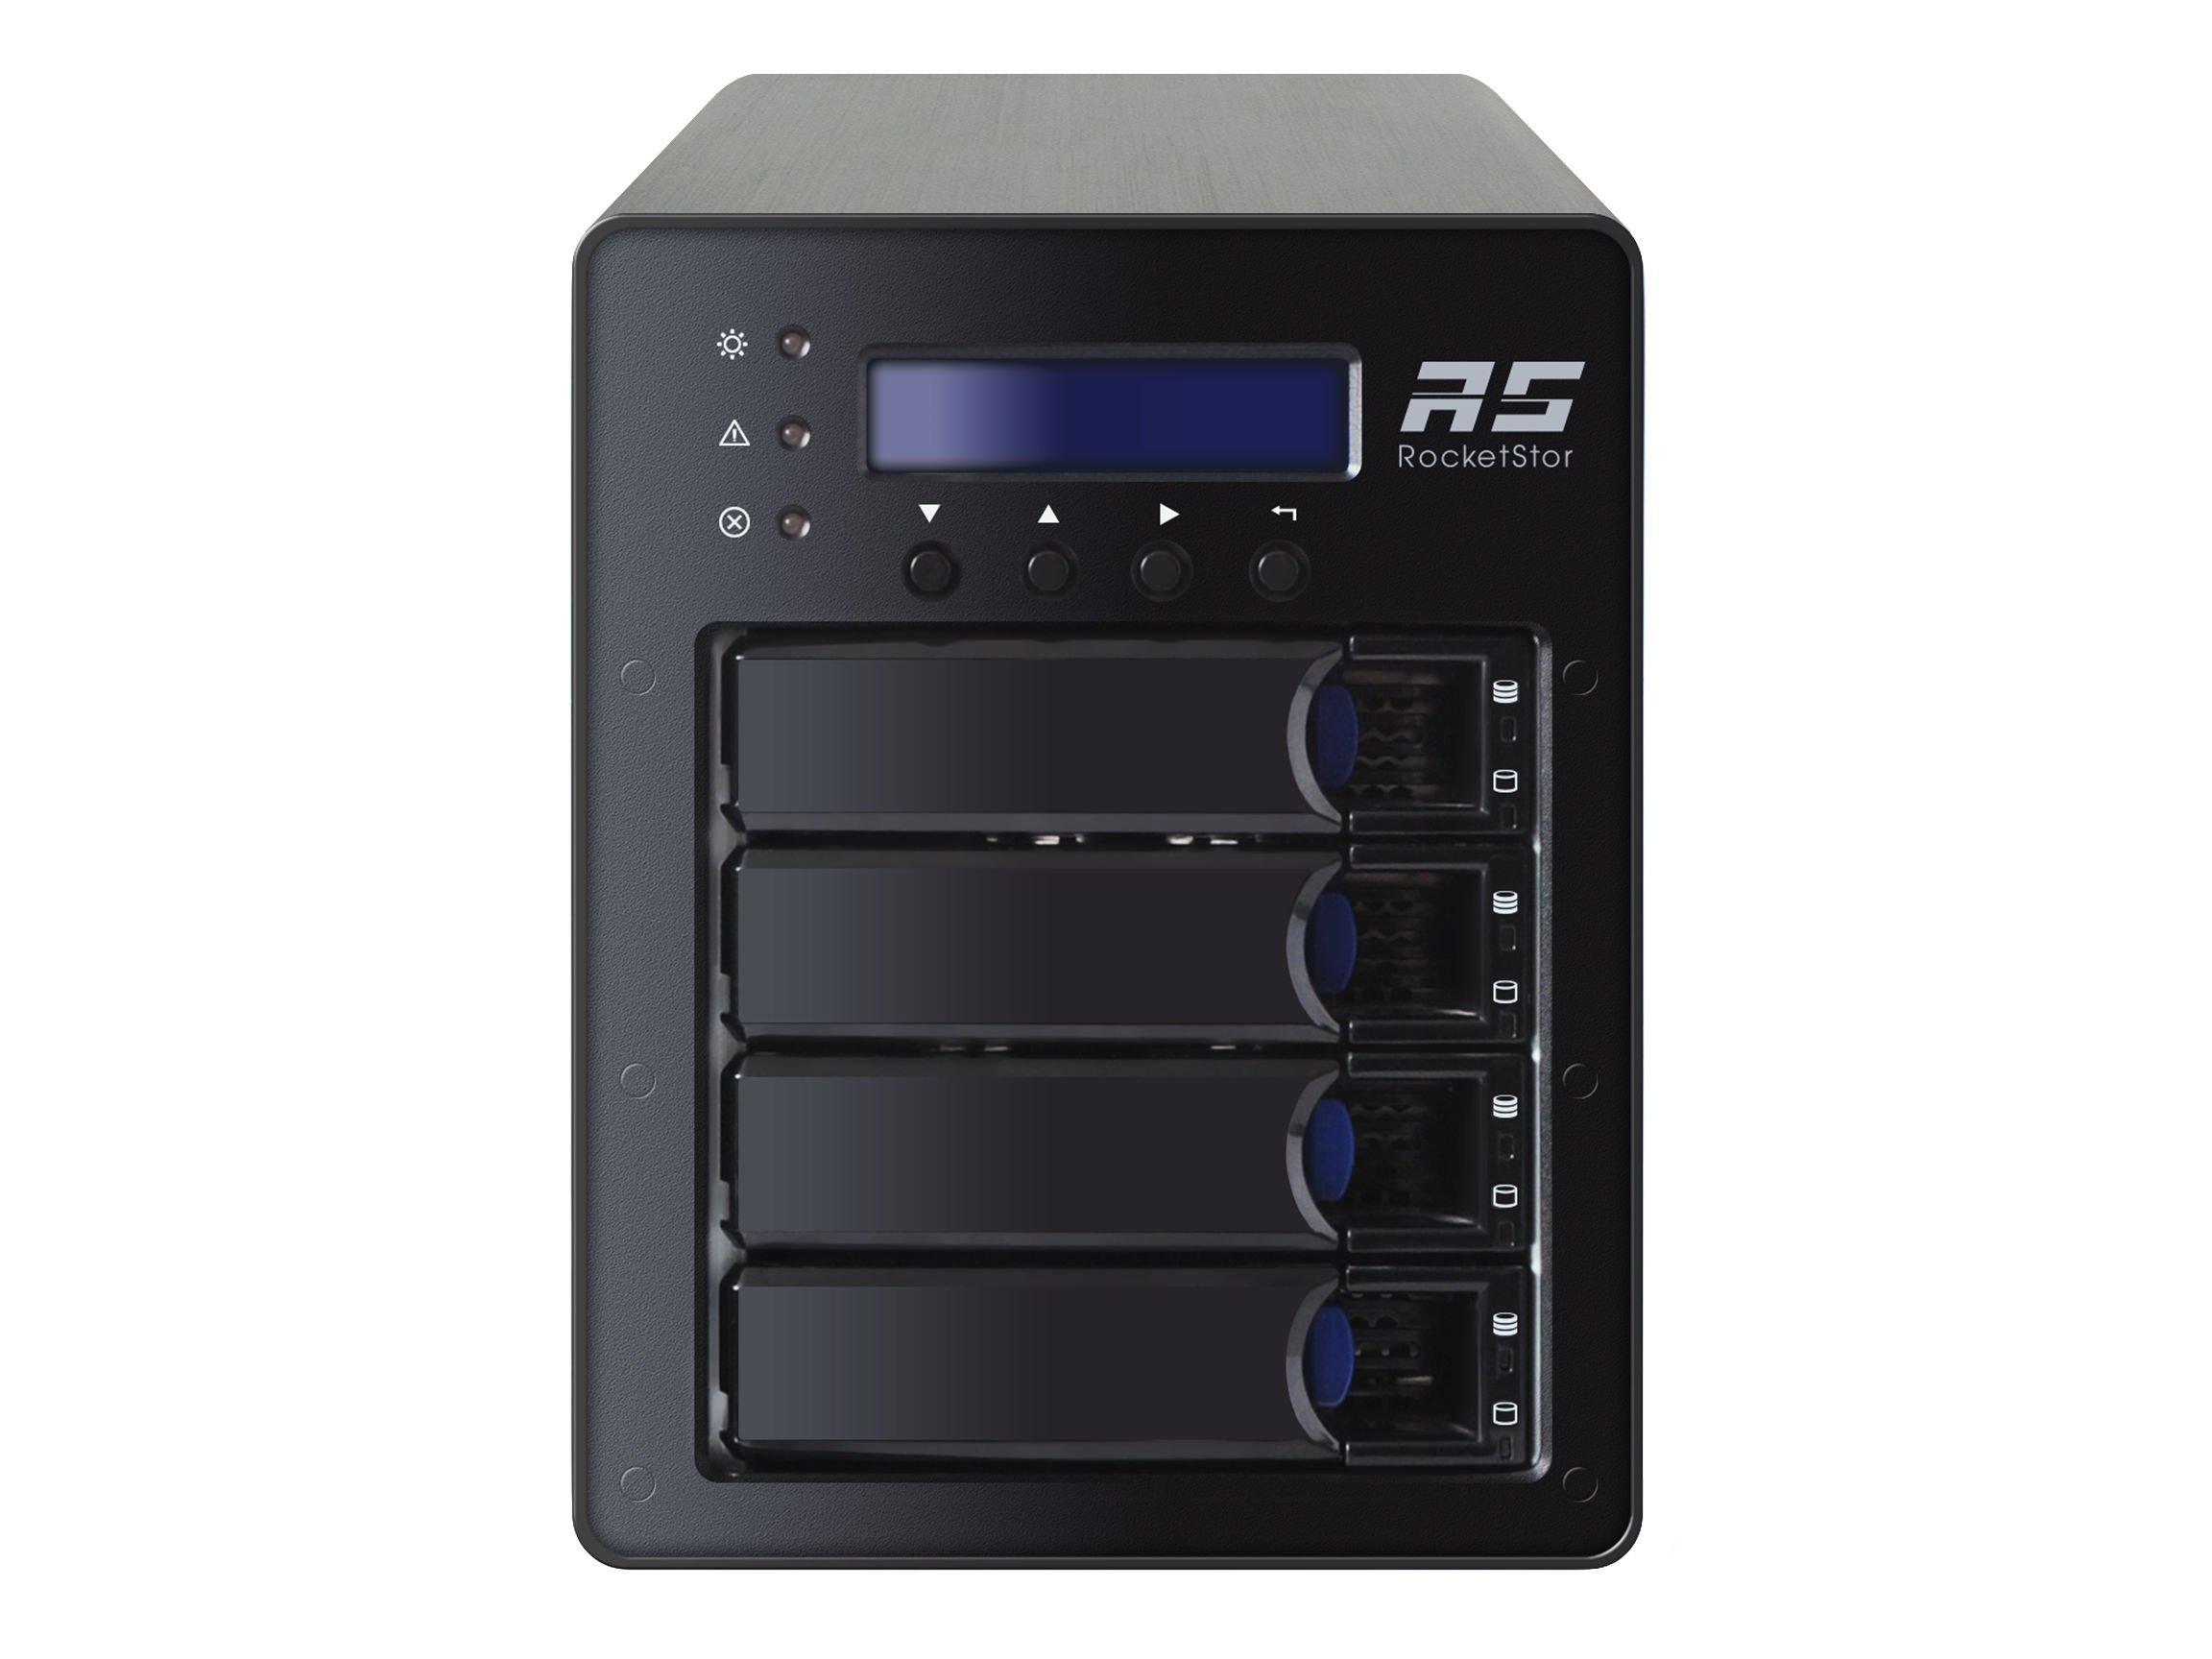 Highpoint RocketStor 6124V 4-Bay USB 3.1 10Gb/s Gen2 RAID Storage Enclosure